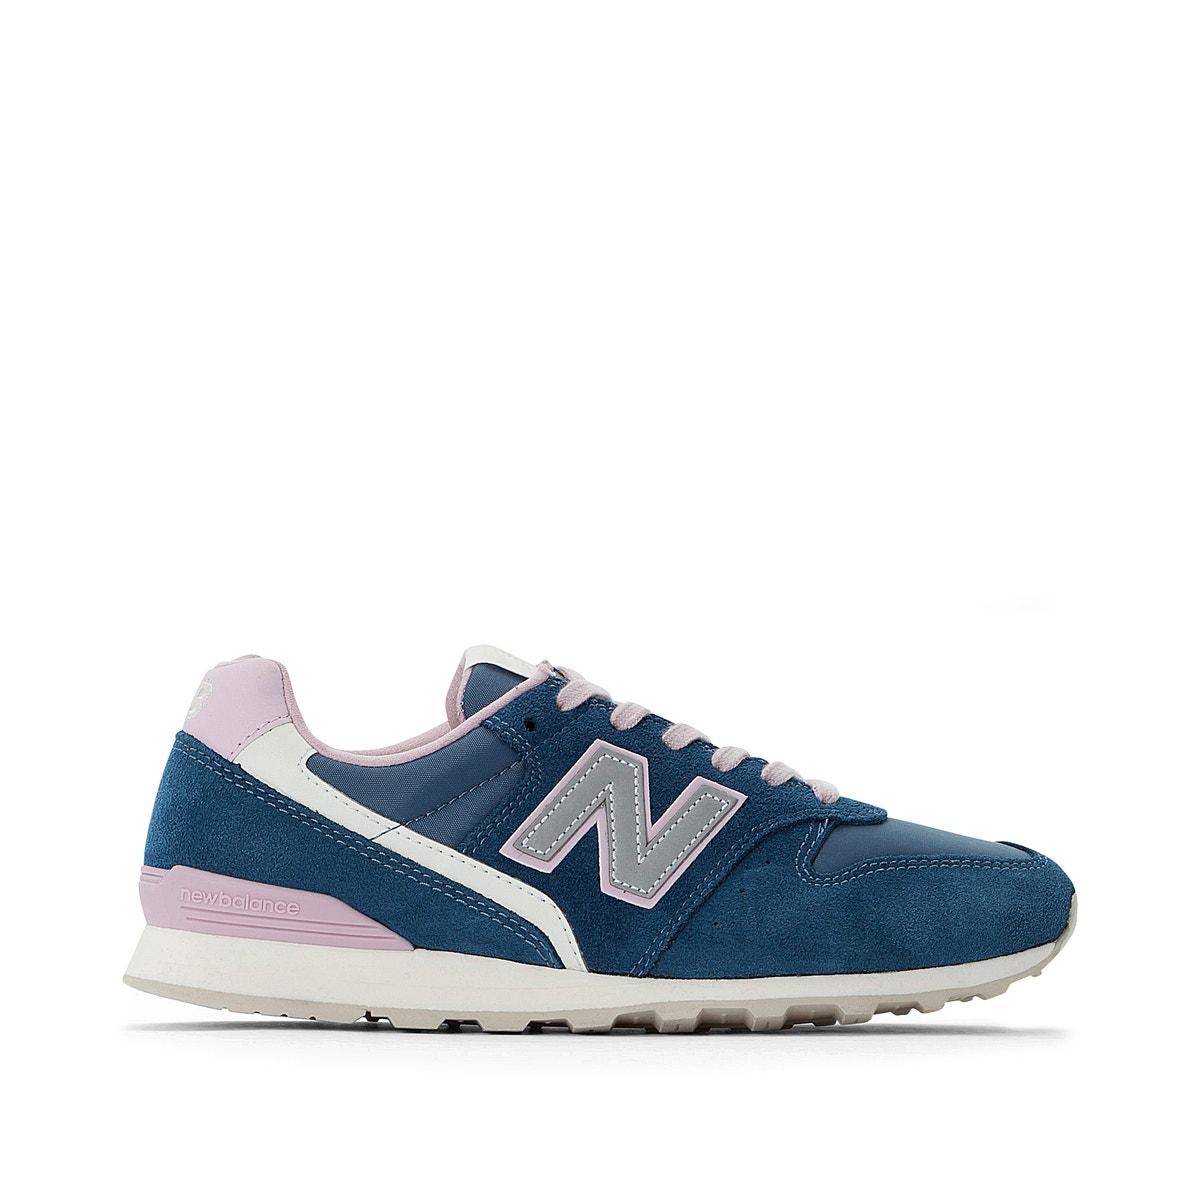 New Balance - New Balance WL996AE Mix Trainers 350154762 - 1247